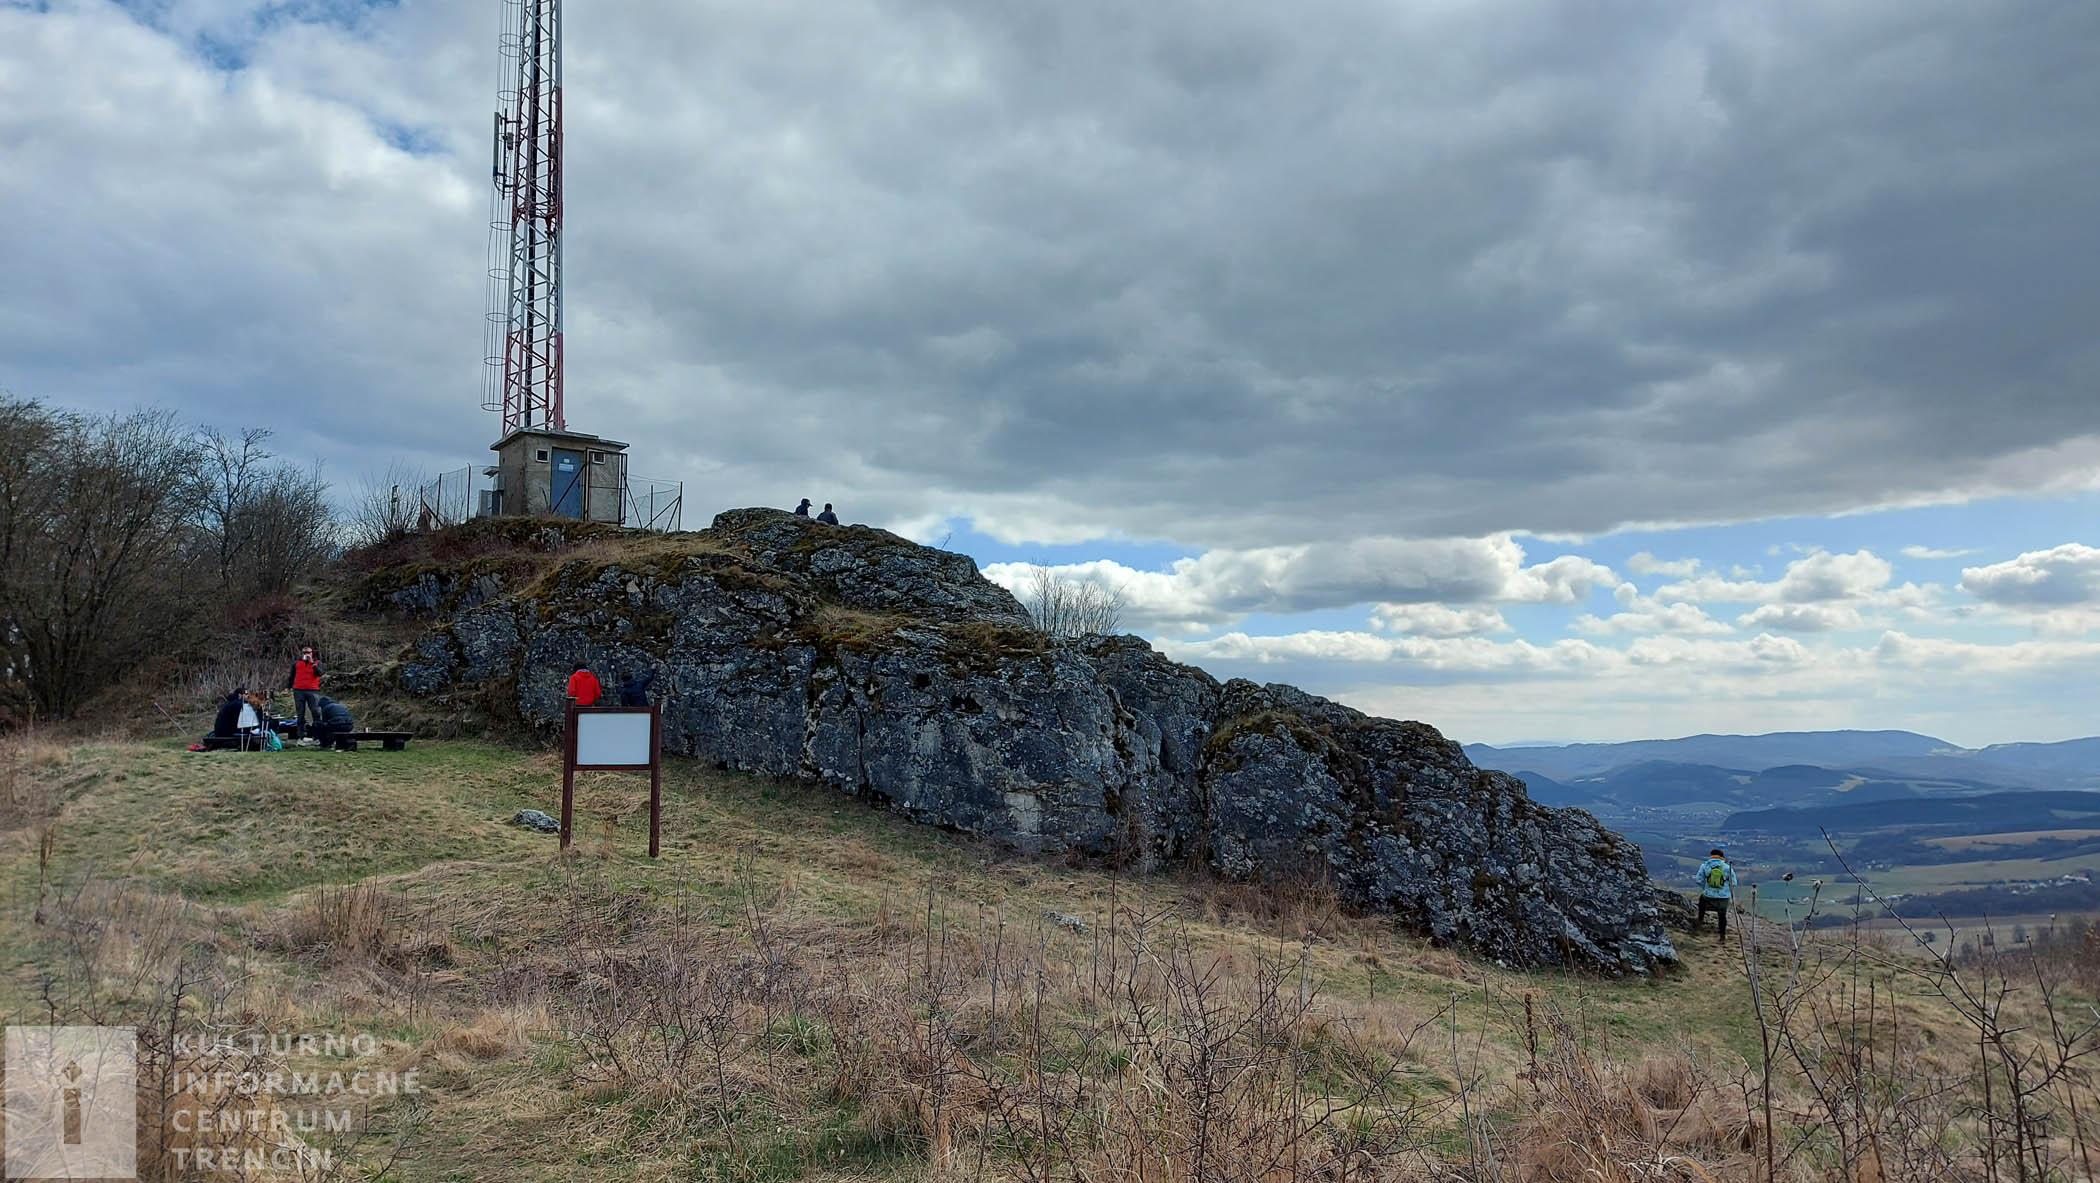 Najvyšší bod vrchu Krasín